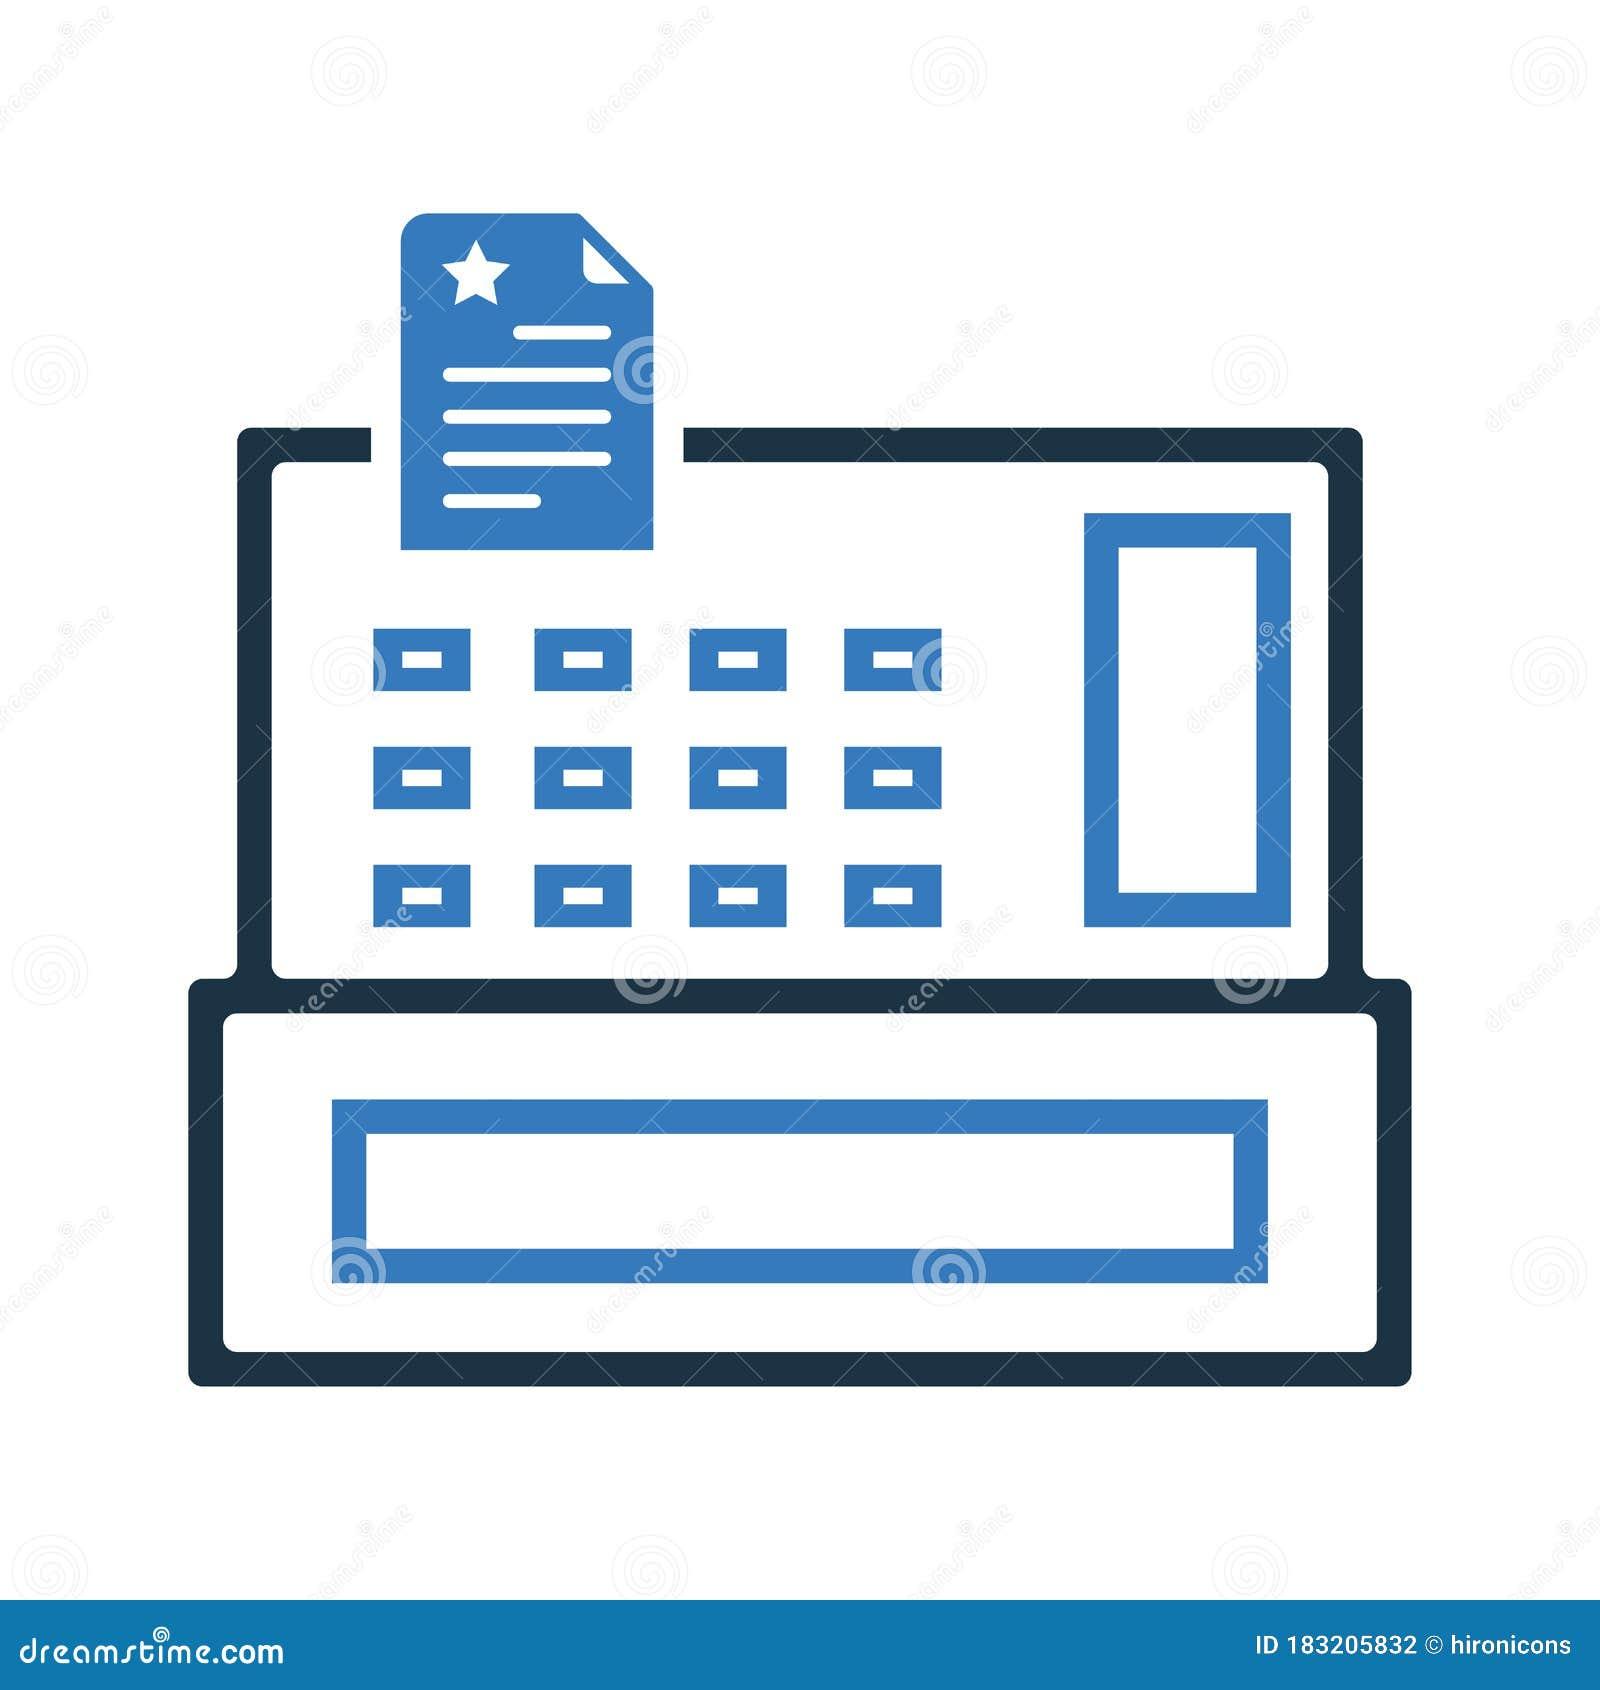 Cash Receipt Register Icon Stock Vector Illustration Of Receipt Symbol 183205832